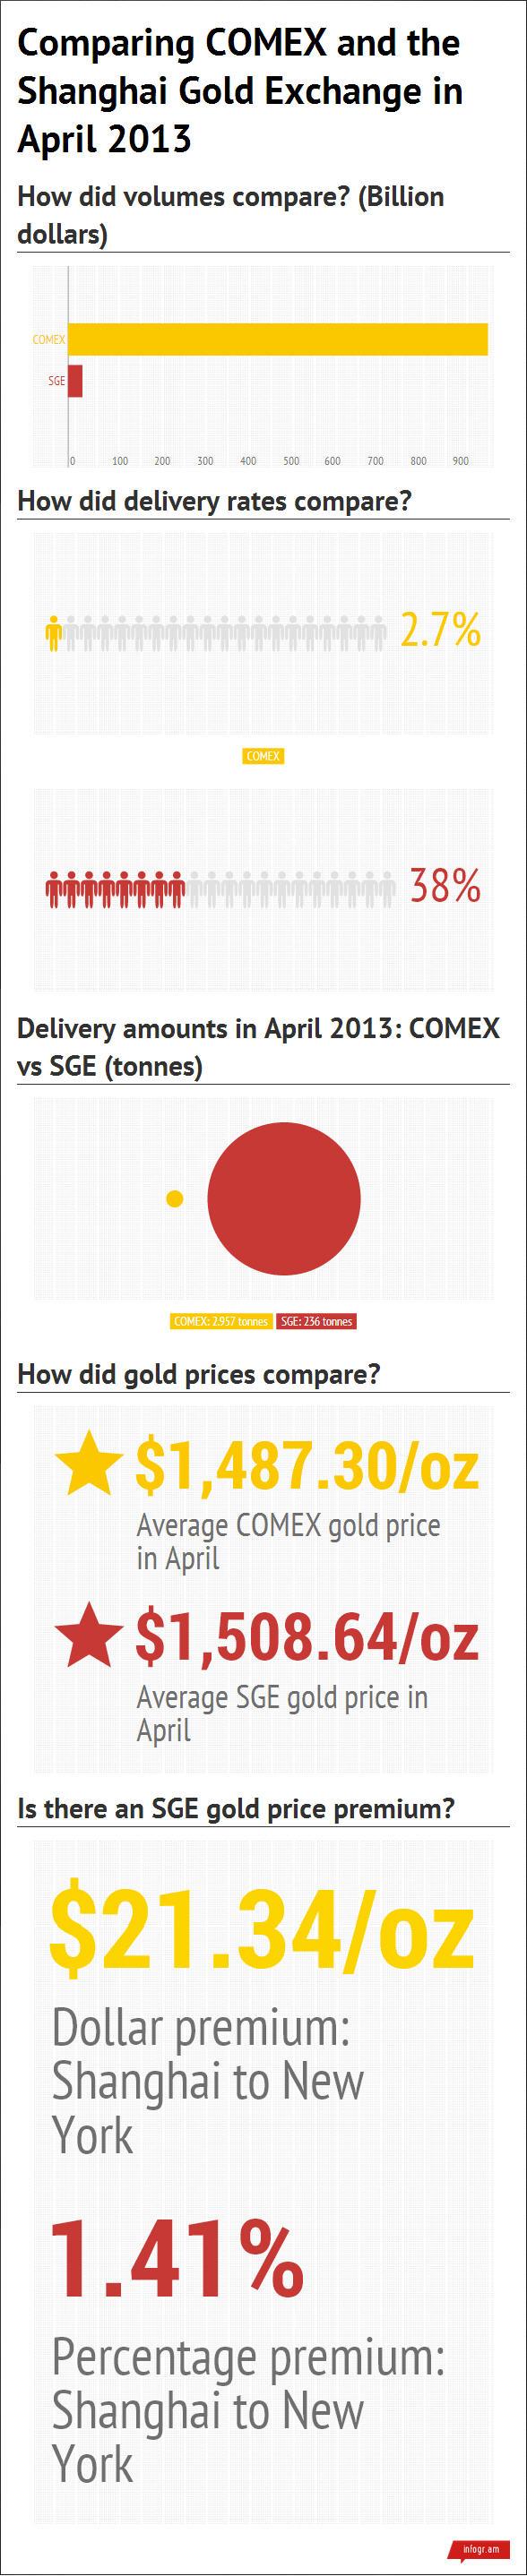 comex-vs-shanghai-gold-price (1)